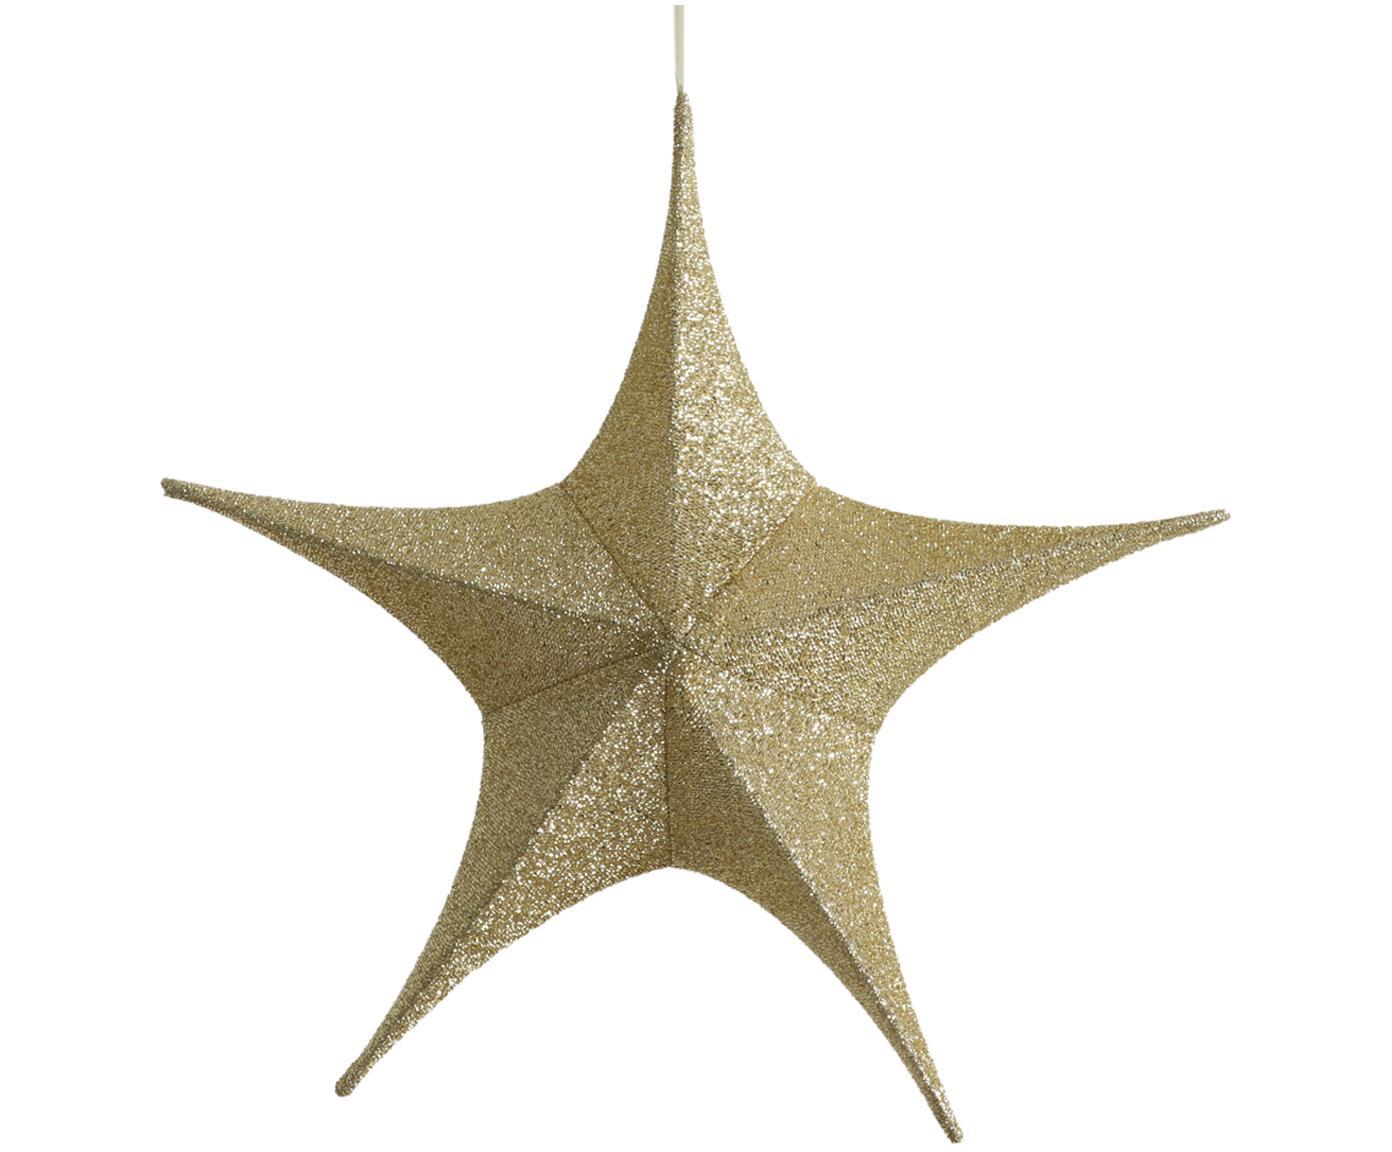 Deko-Anhänger Kamilla, Bezug: Polyester, Gestell: Metall, Goldfarben, 65 x 60 cm